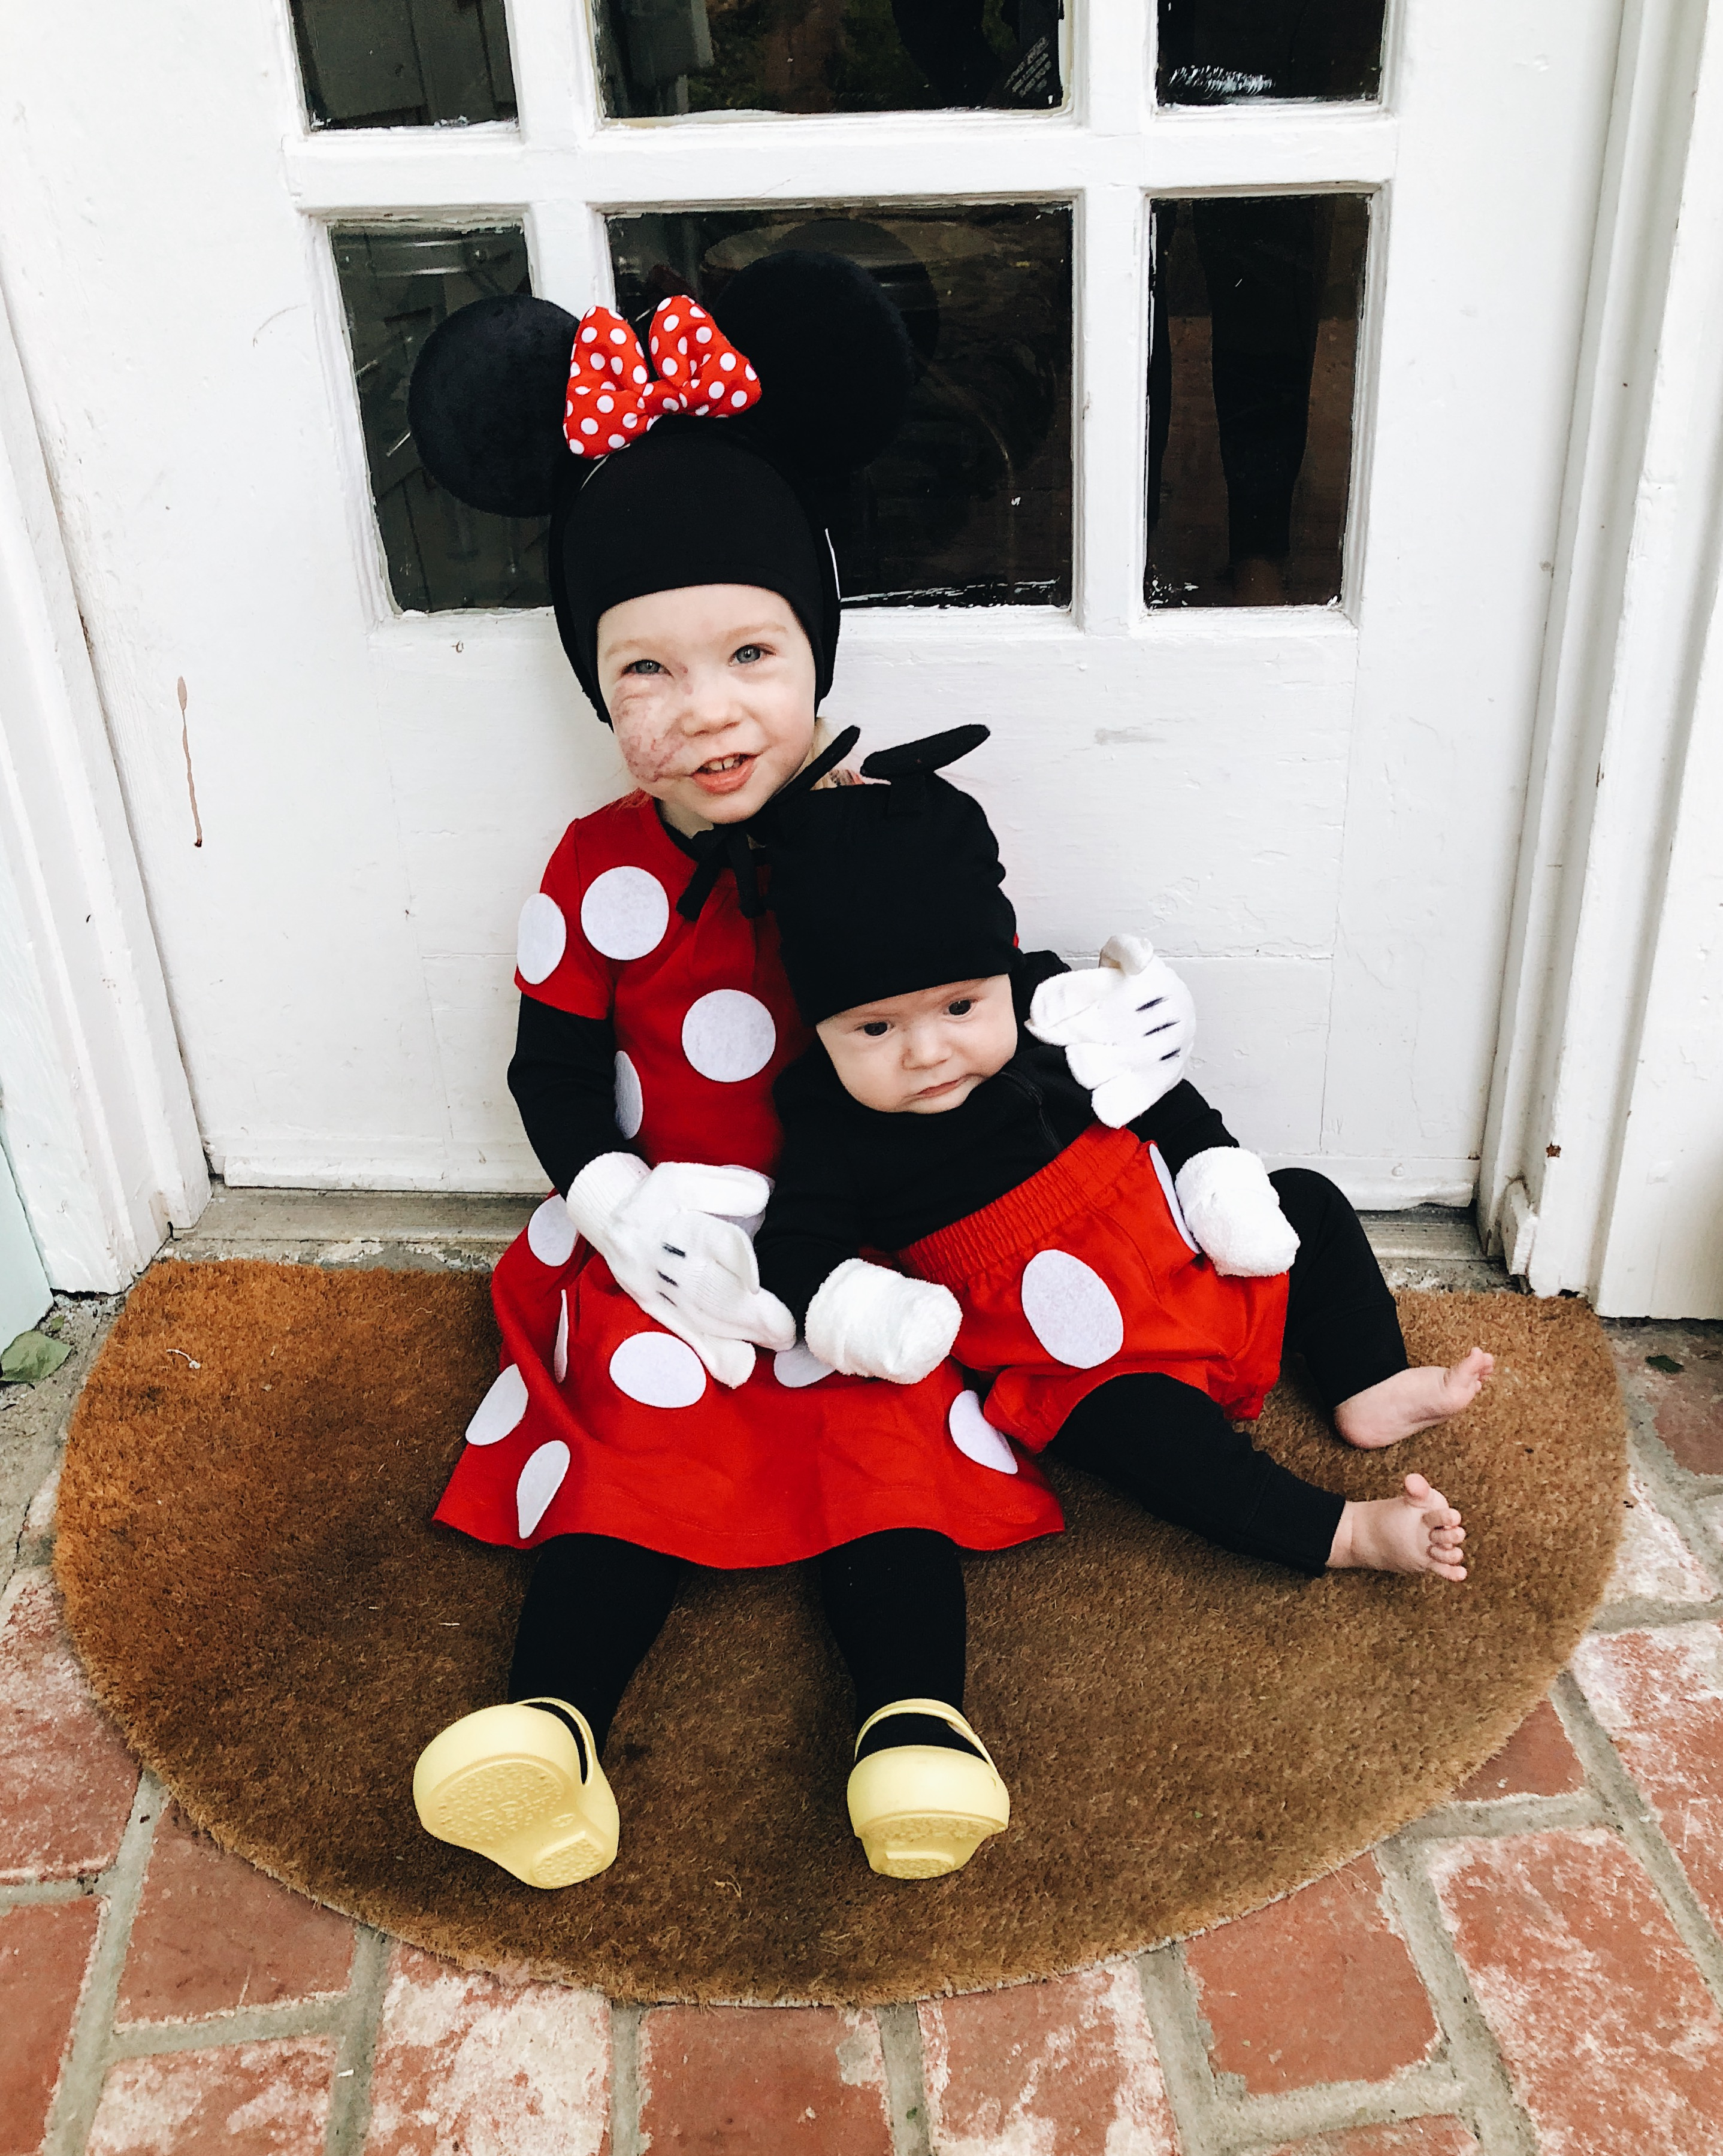 Mickey u0026 Minnie Mouse Sibling Halloween Costumes  sc 1 st  Typical Katie & Mickey u0026 Minnie Mouse Sibling Halloween Costumes - Typical Katie